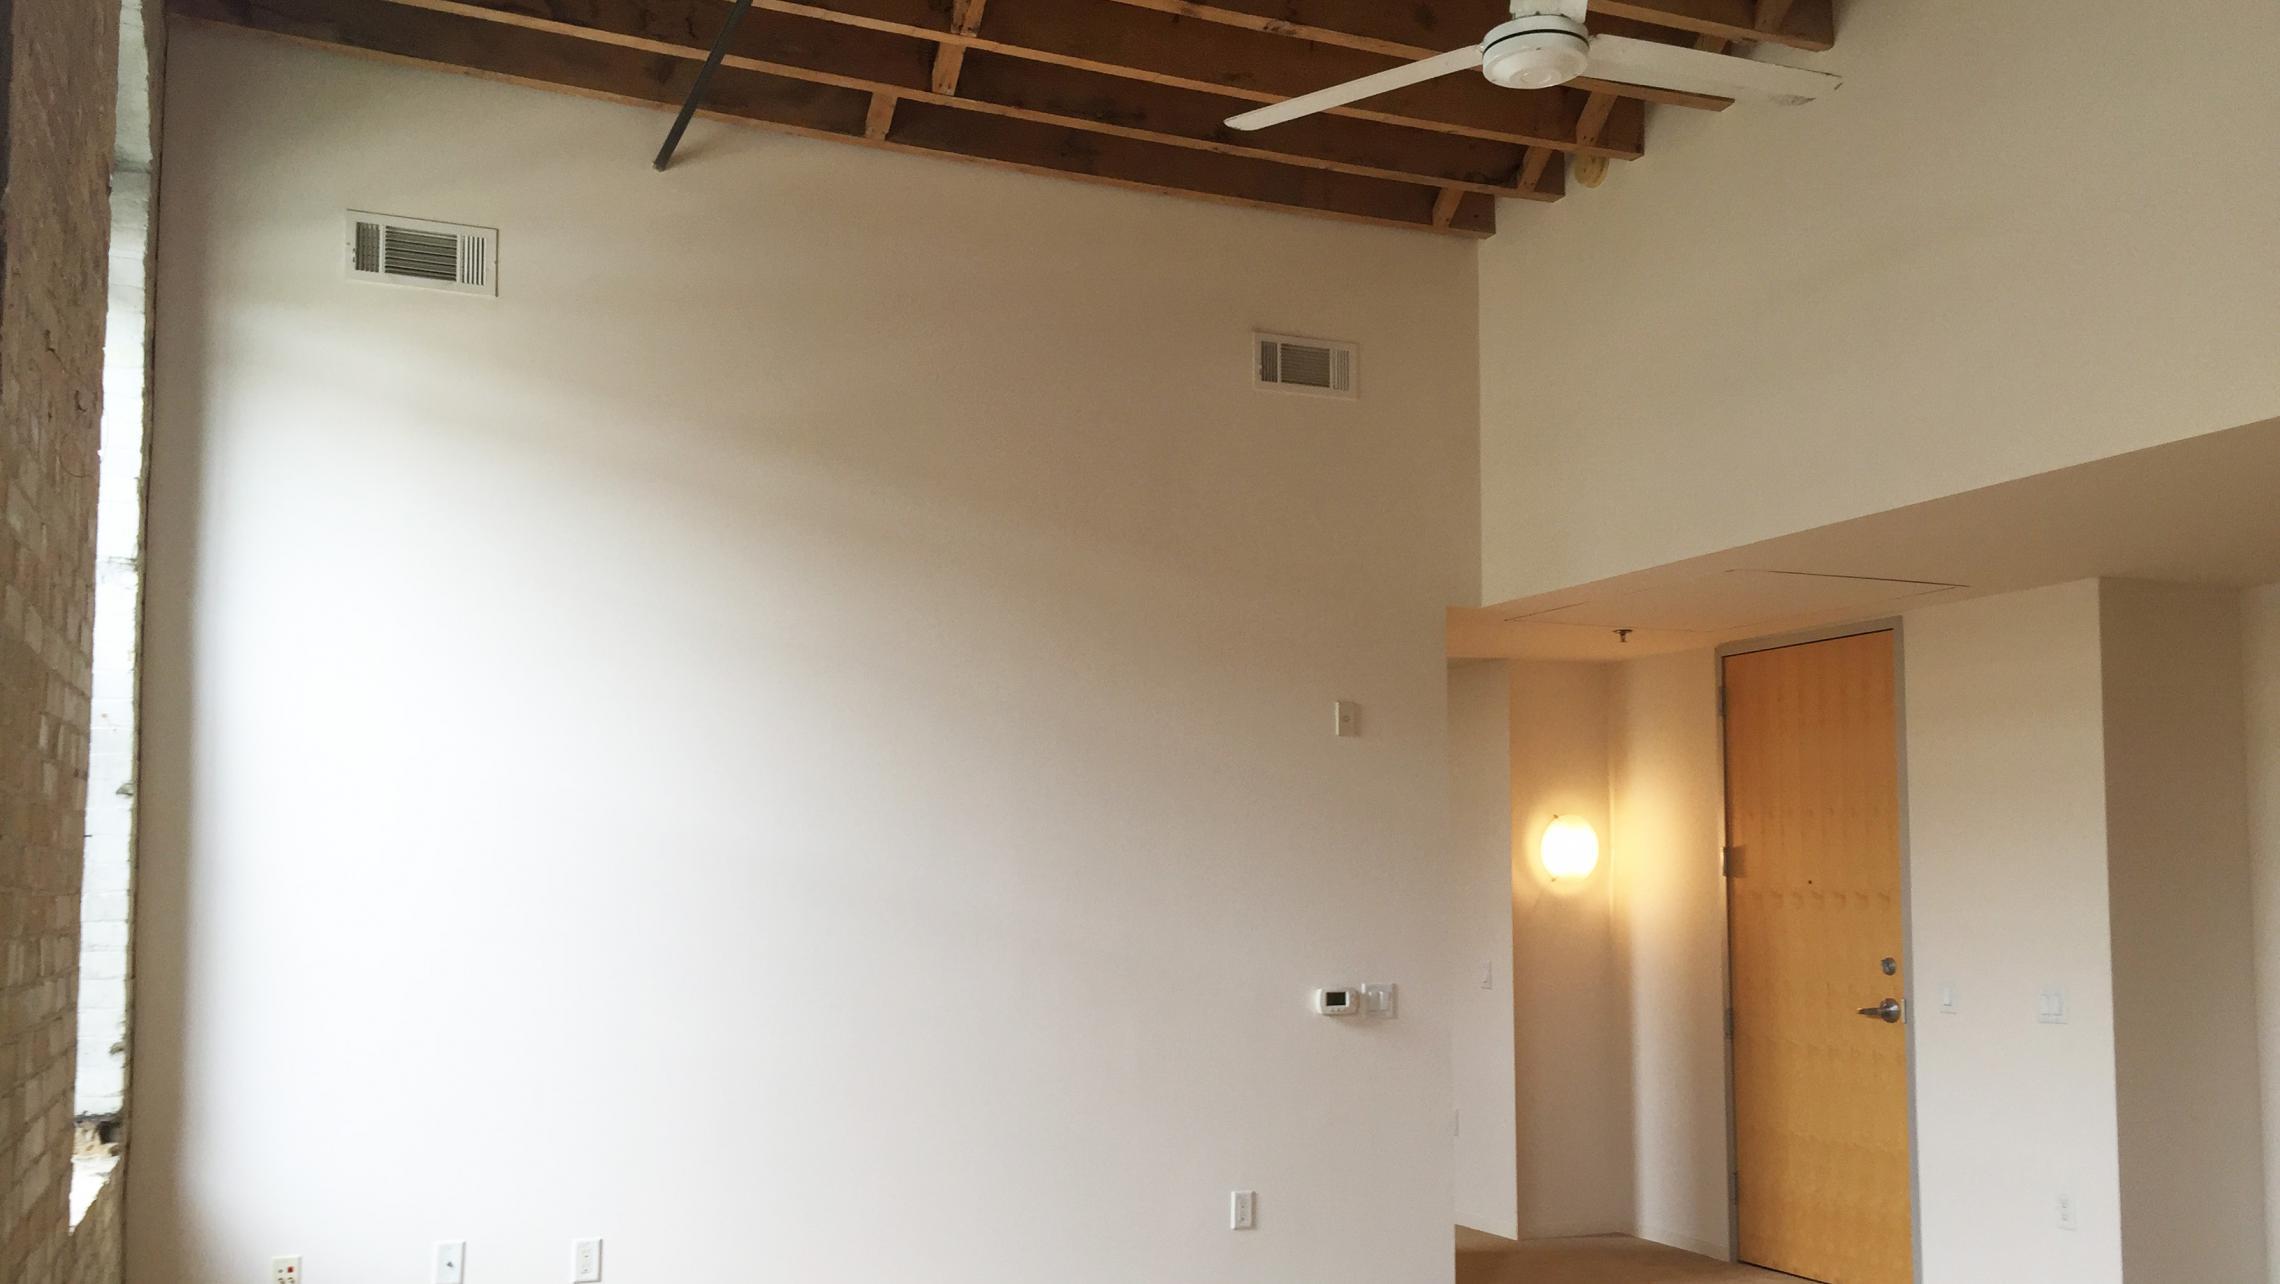 ULI Tobacco Lofts - E208 - Living Area with Historic Touches